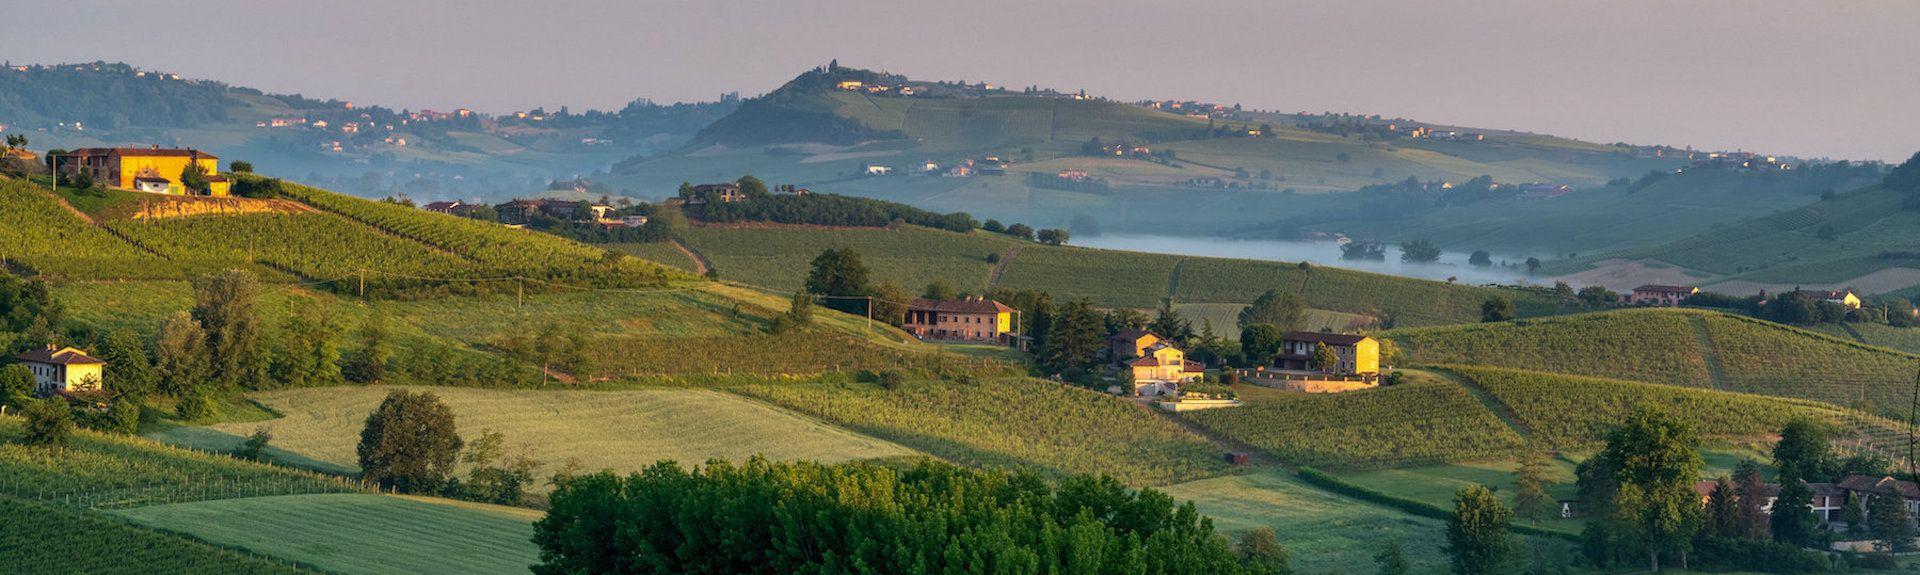 Montaldo Scarampi, Piemonte, Italia